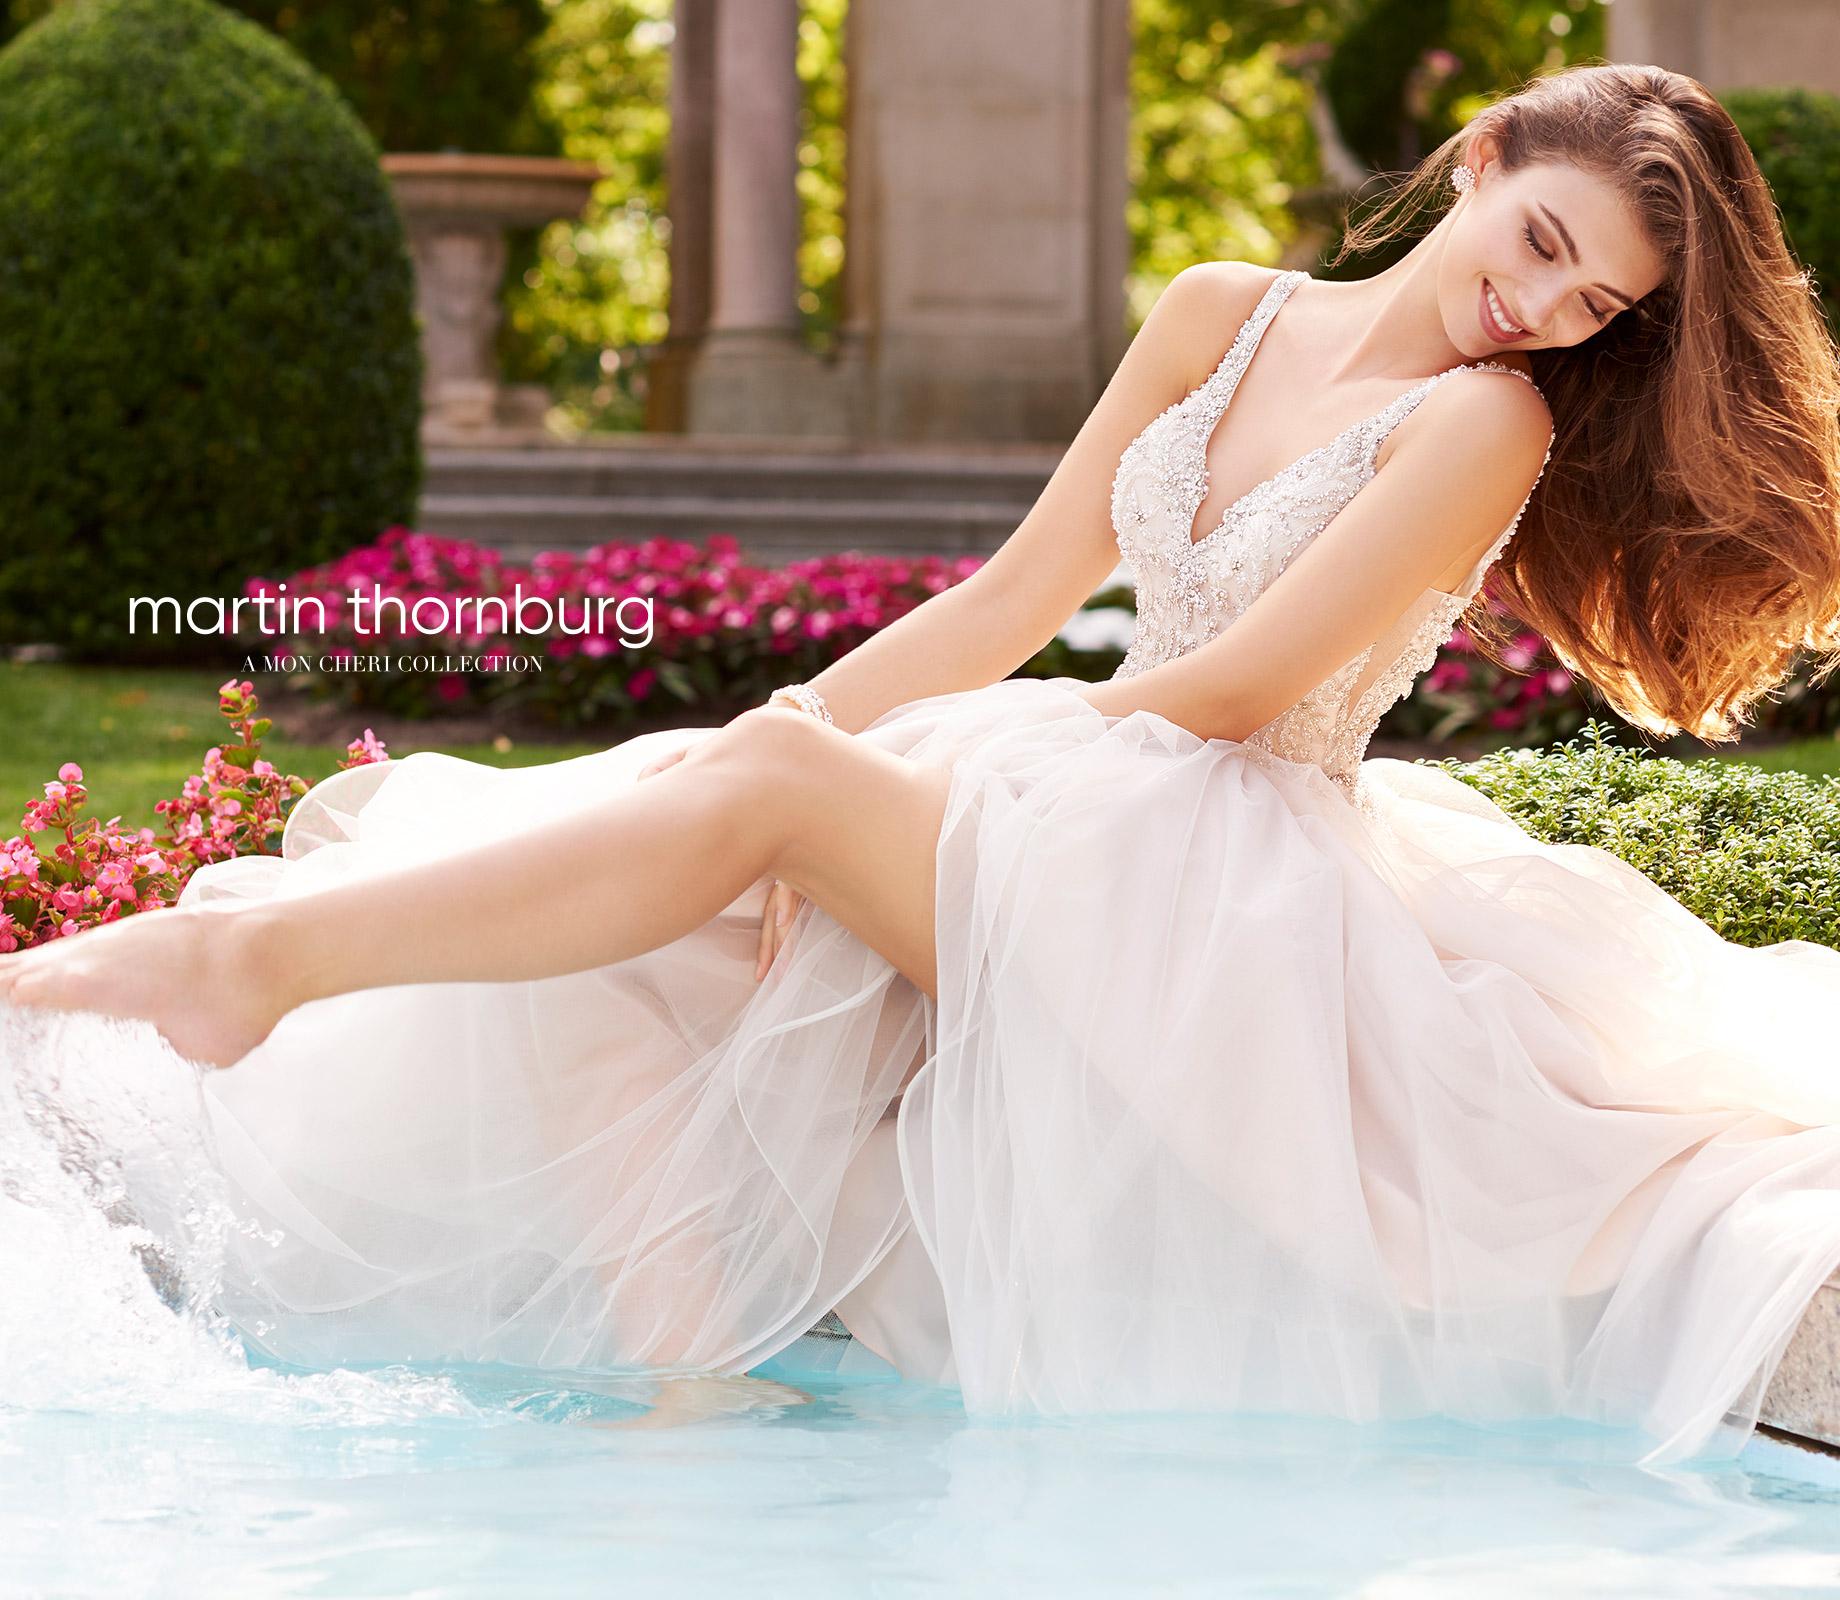 beaded-wedding-dress-Martin-Thornburg-Collection-118253_C